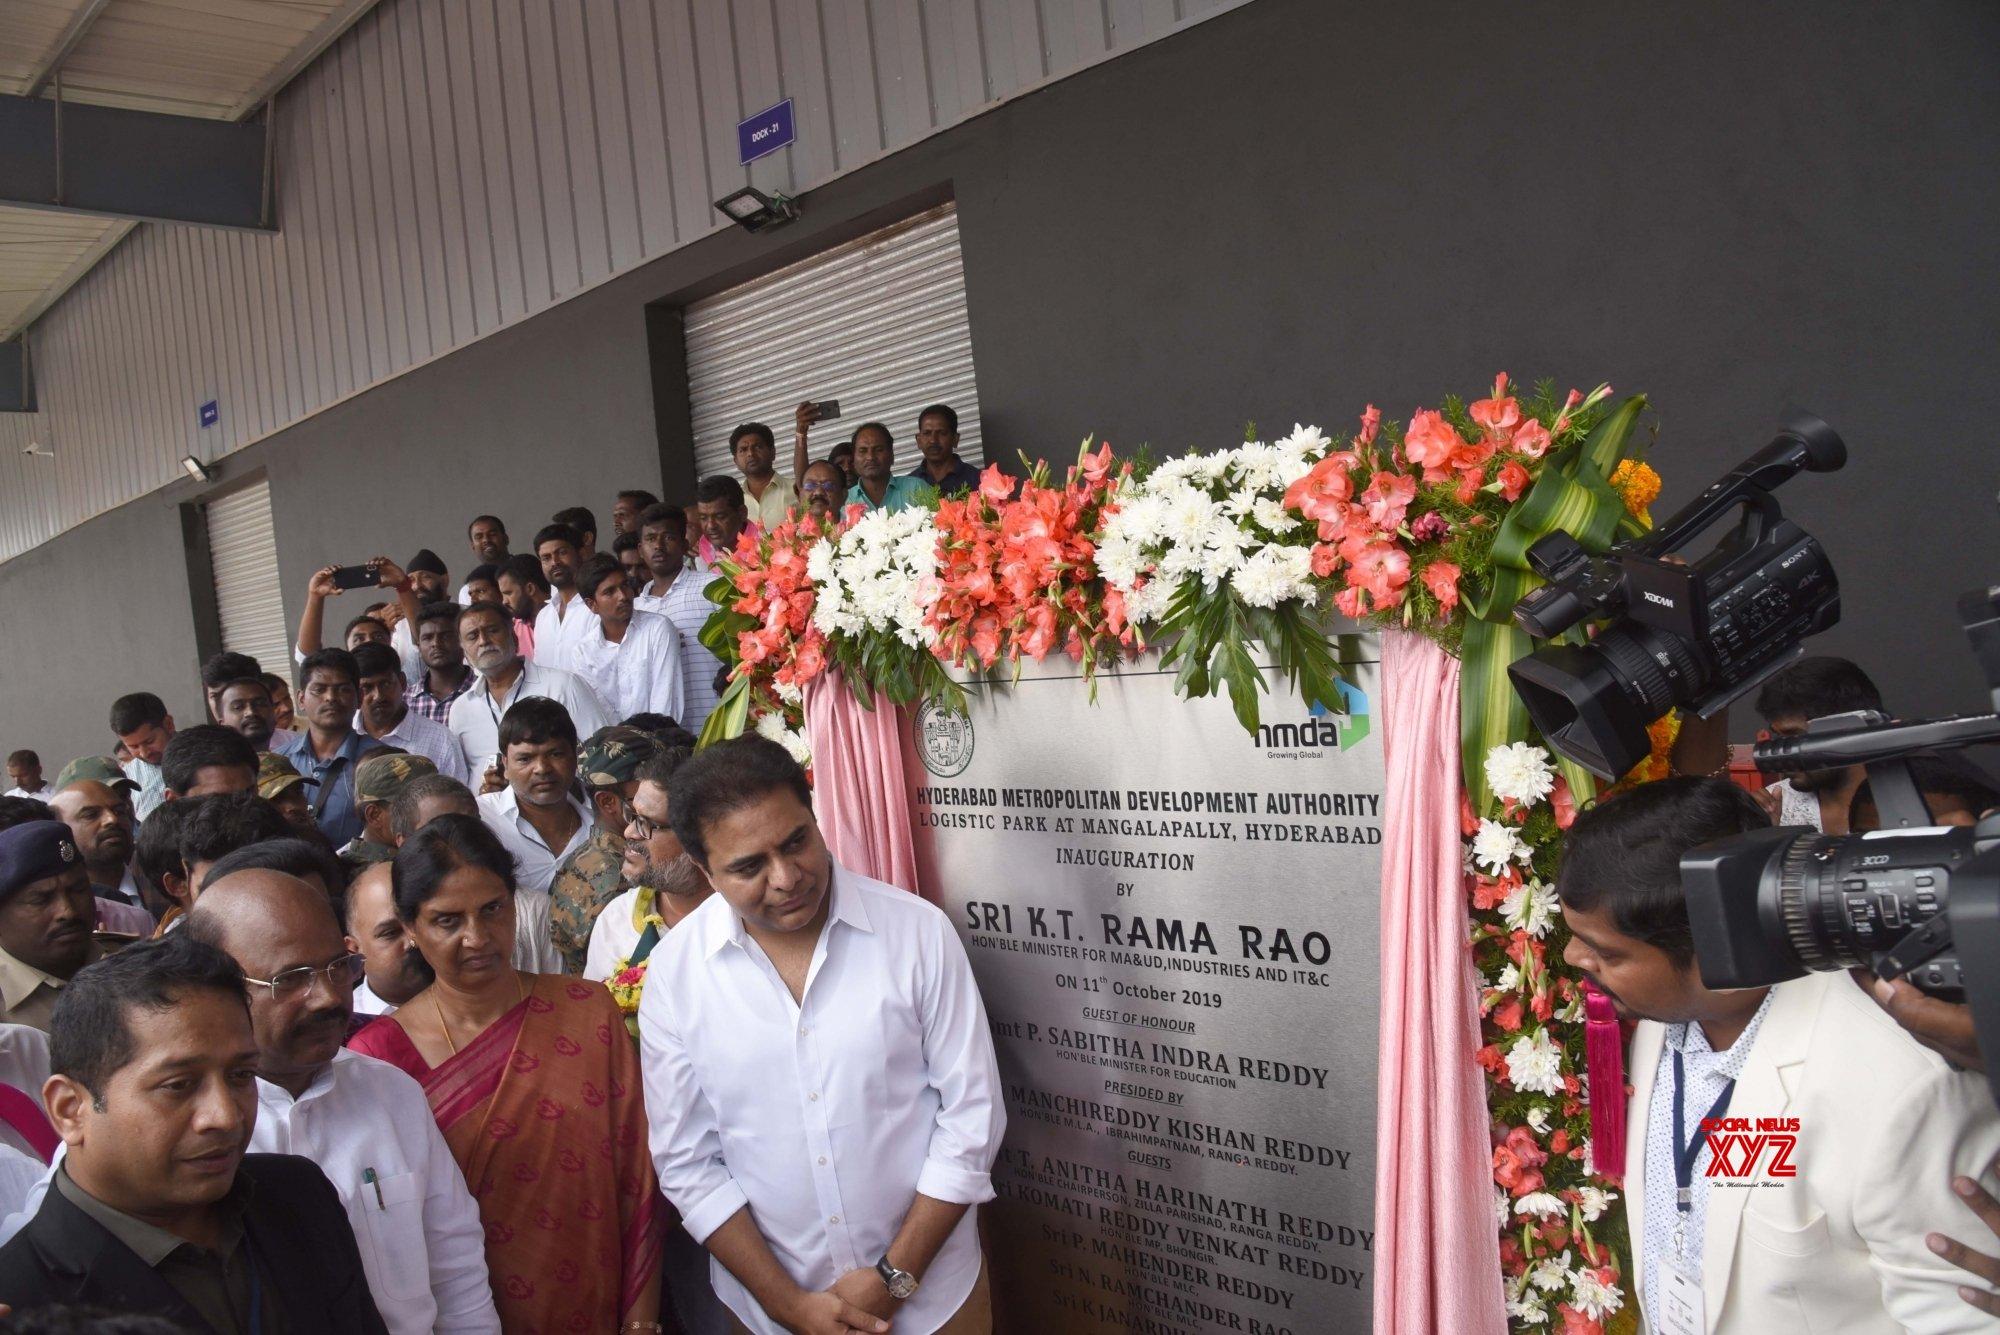 Rangareddy: K.T. Rama Rao inaugurates Tealangan's first - ever logistics park #Gallery